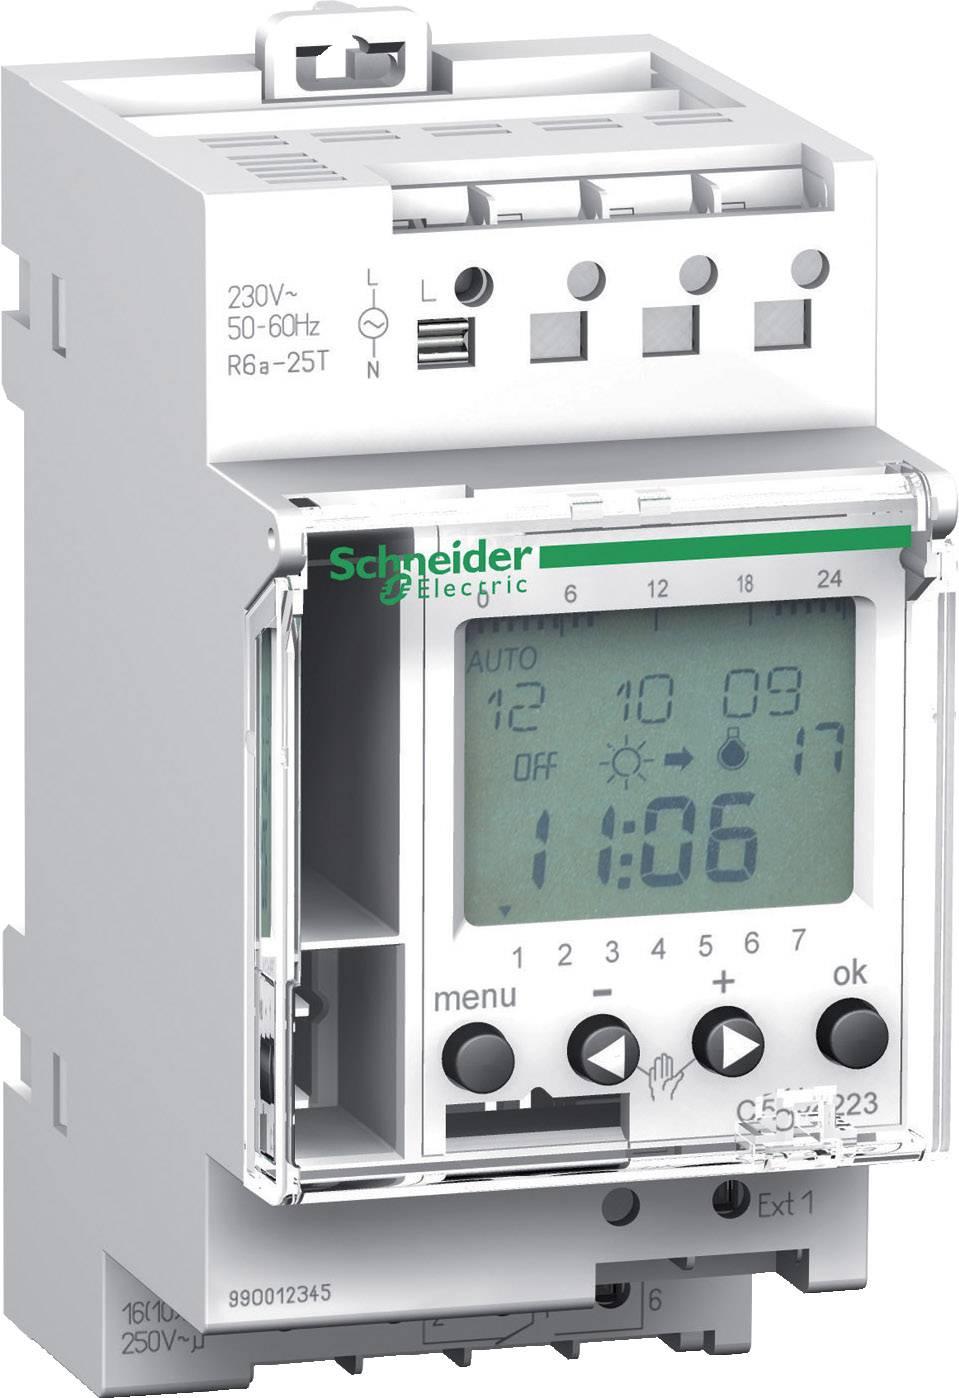 Řezačka CCT15223 Ic Astro 1C Schneider Electric CCT15223